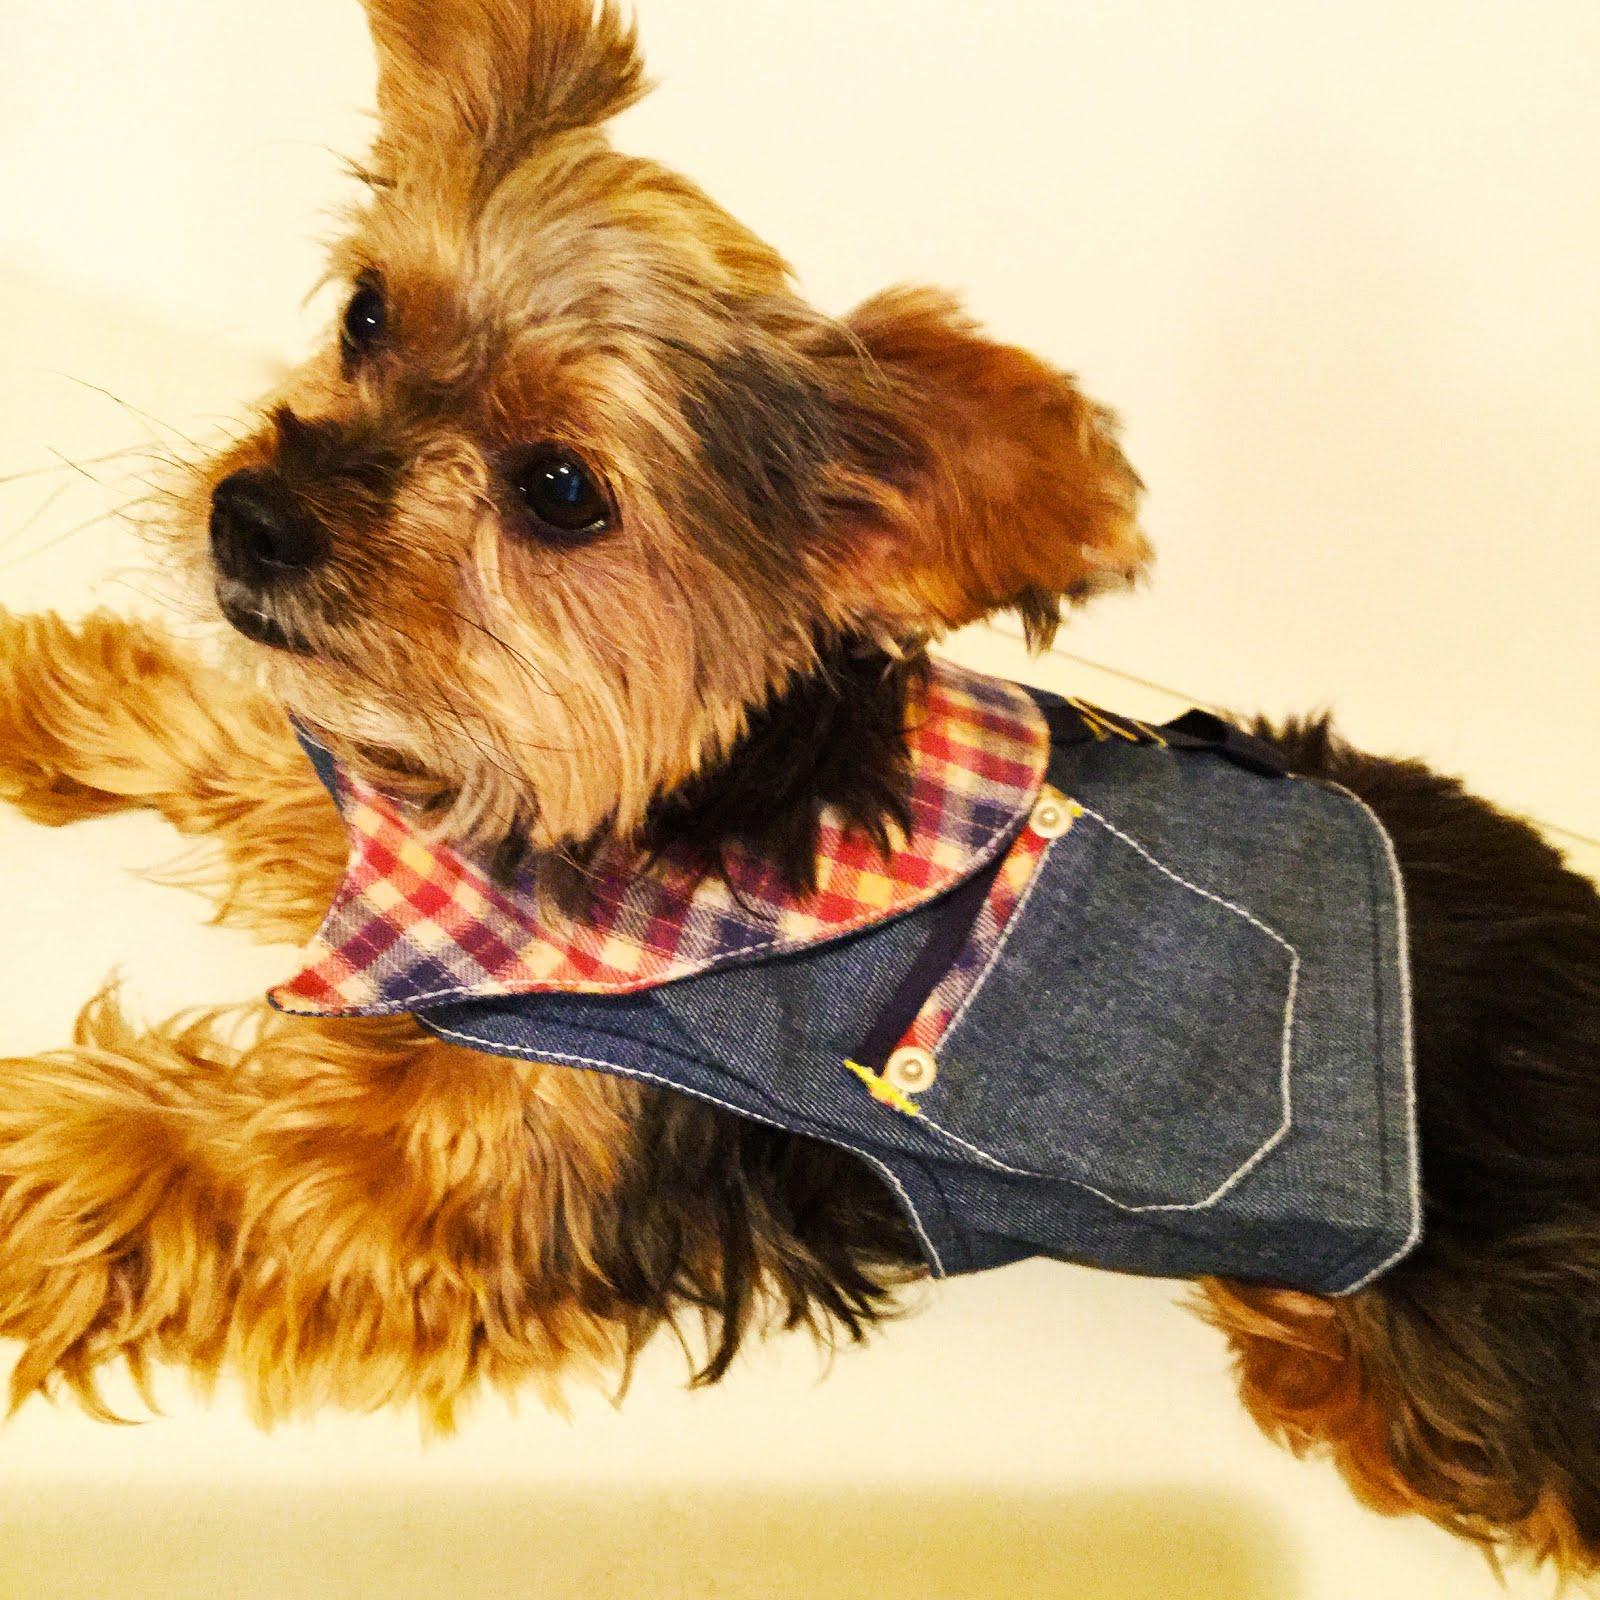 fashionable dog's harness shirts